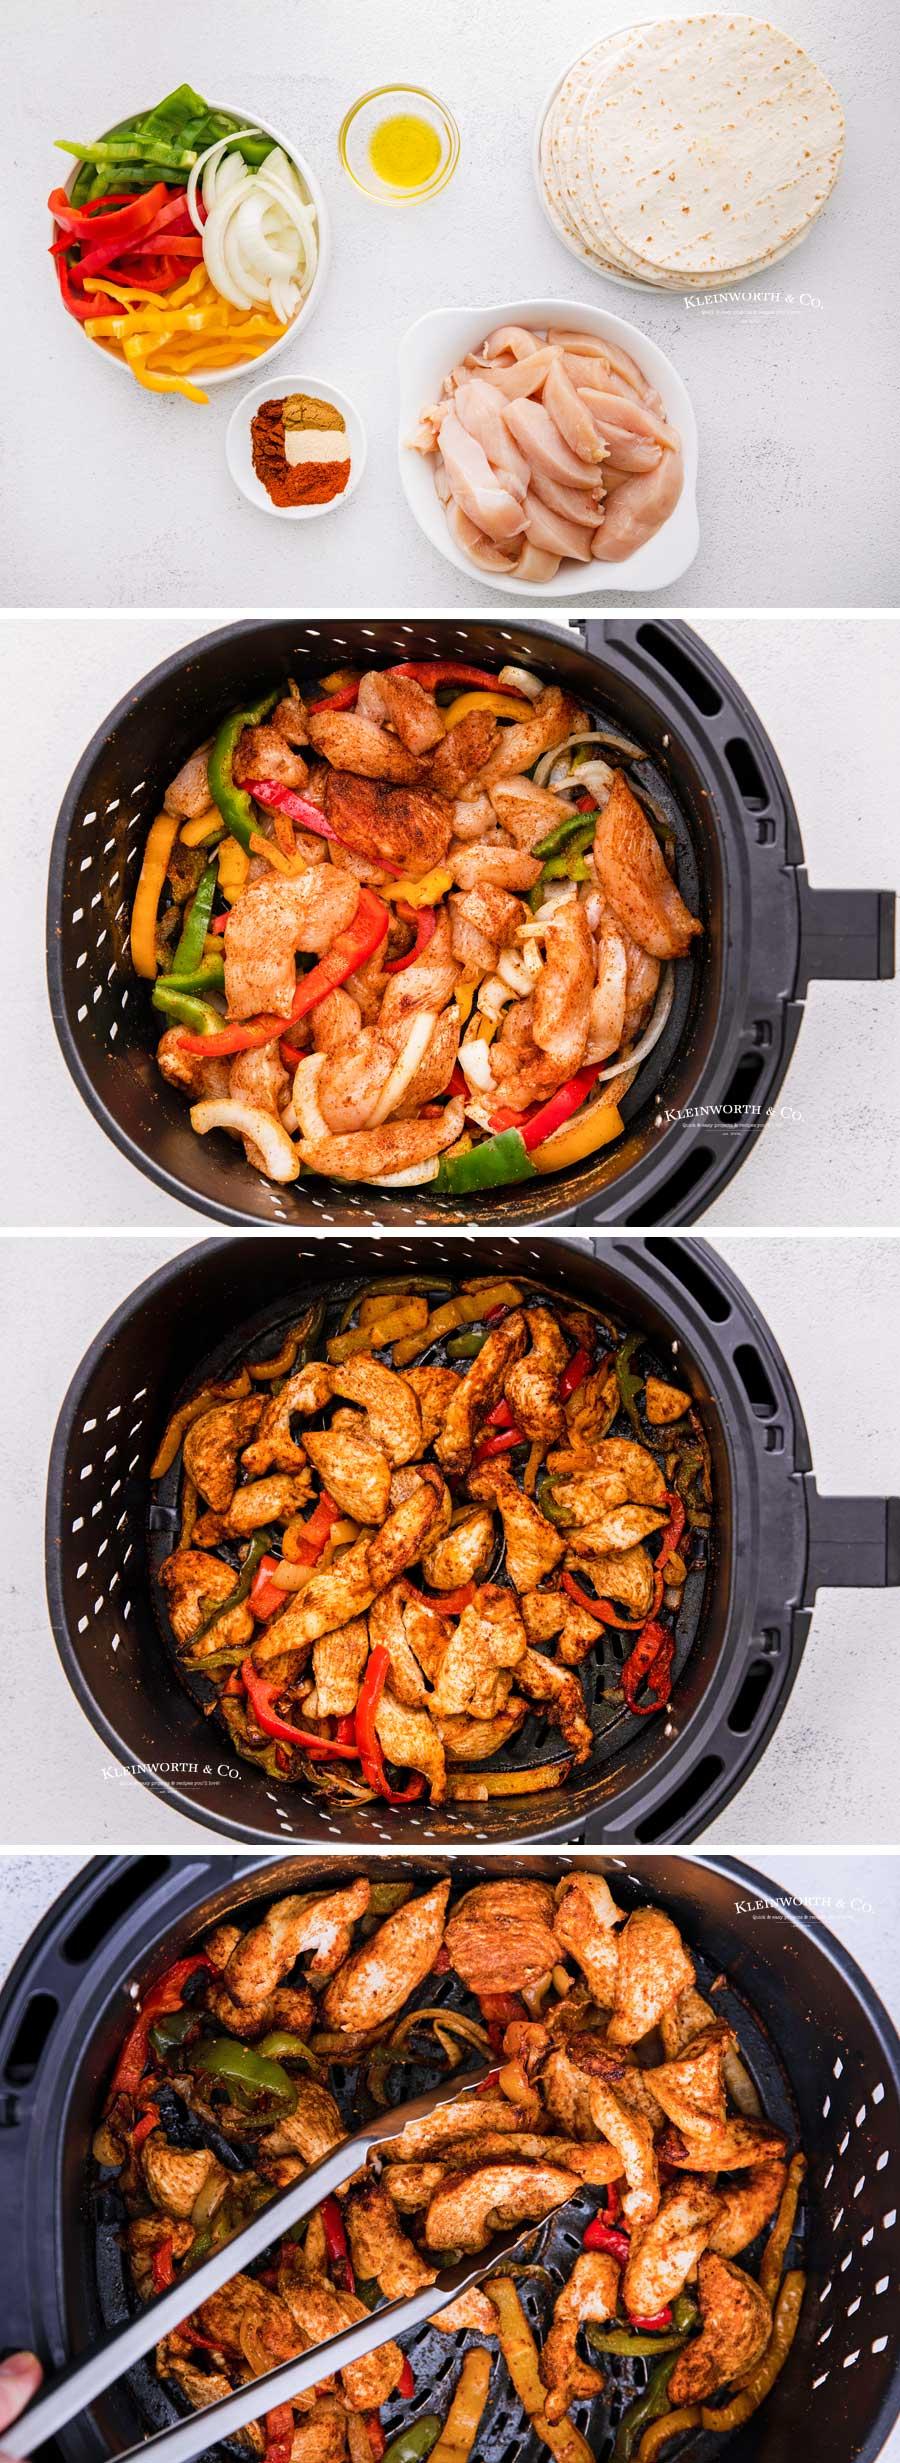 how to make Air Fryer Chicken Fajitas